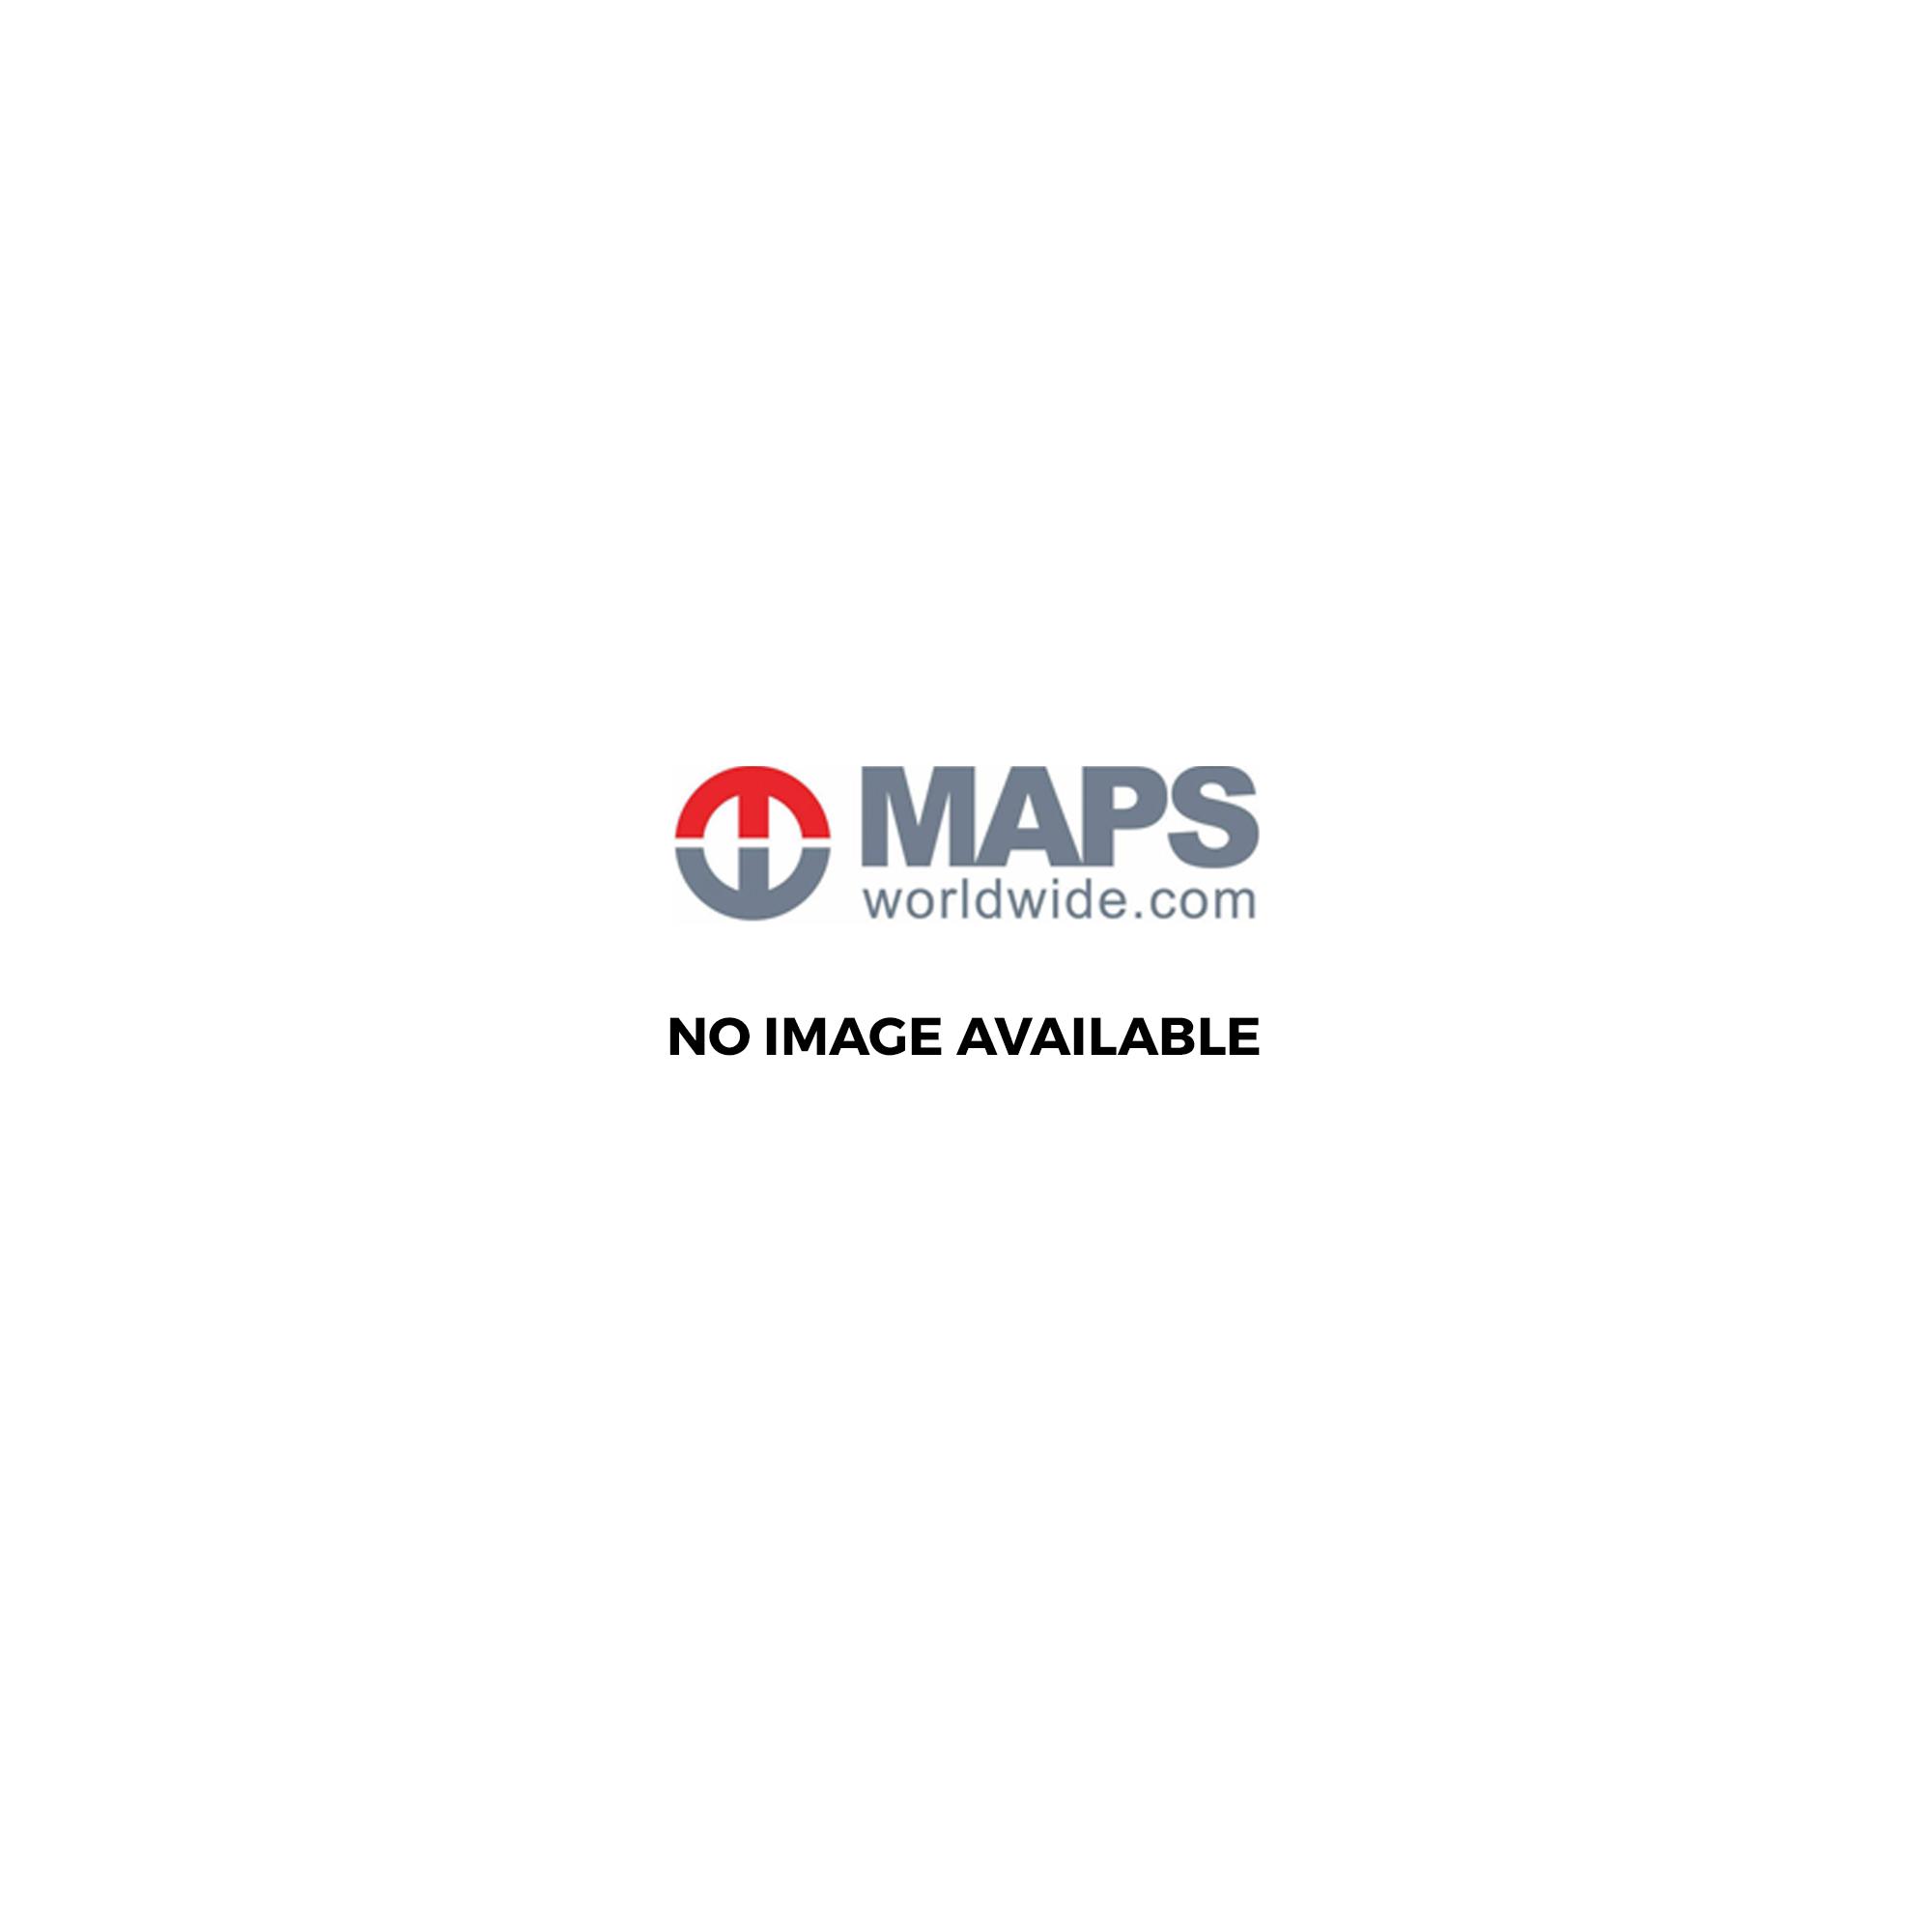 IGN map 86202 - Balearic Islands / Mallorca / Menorca / Ibiza Road ...